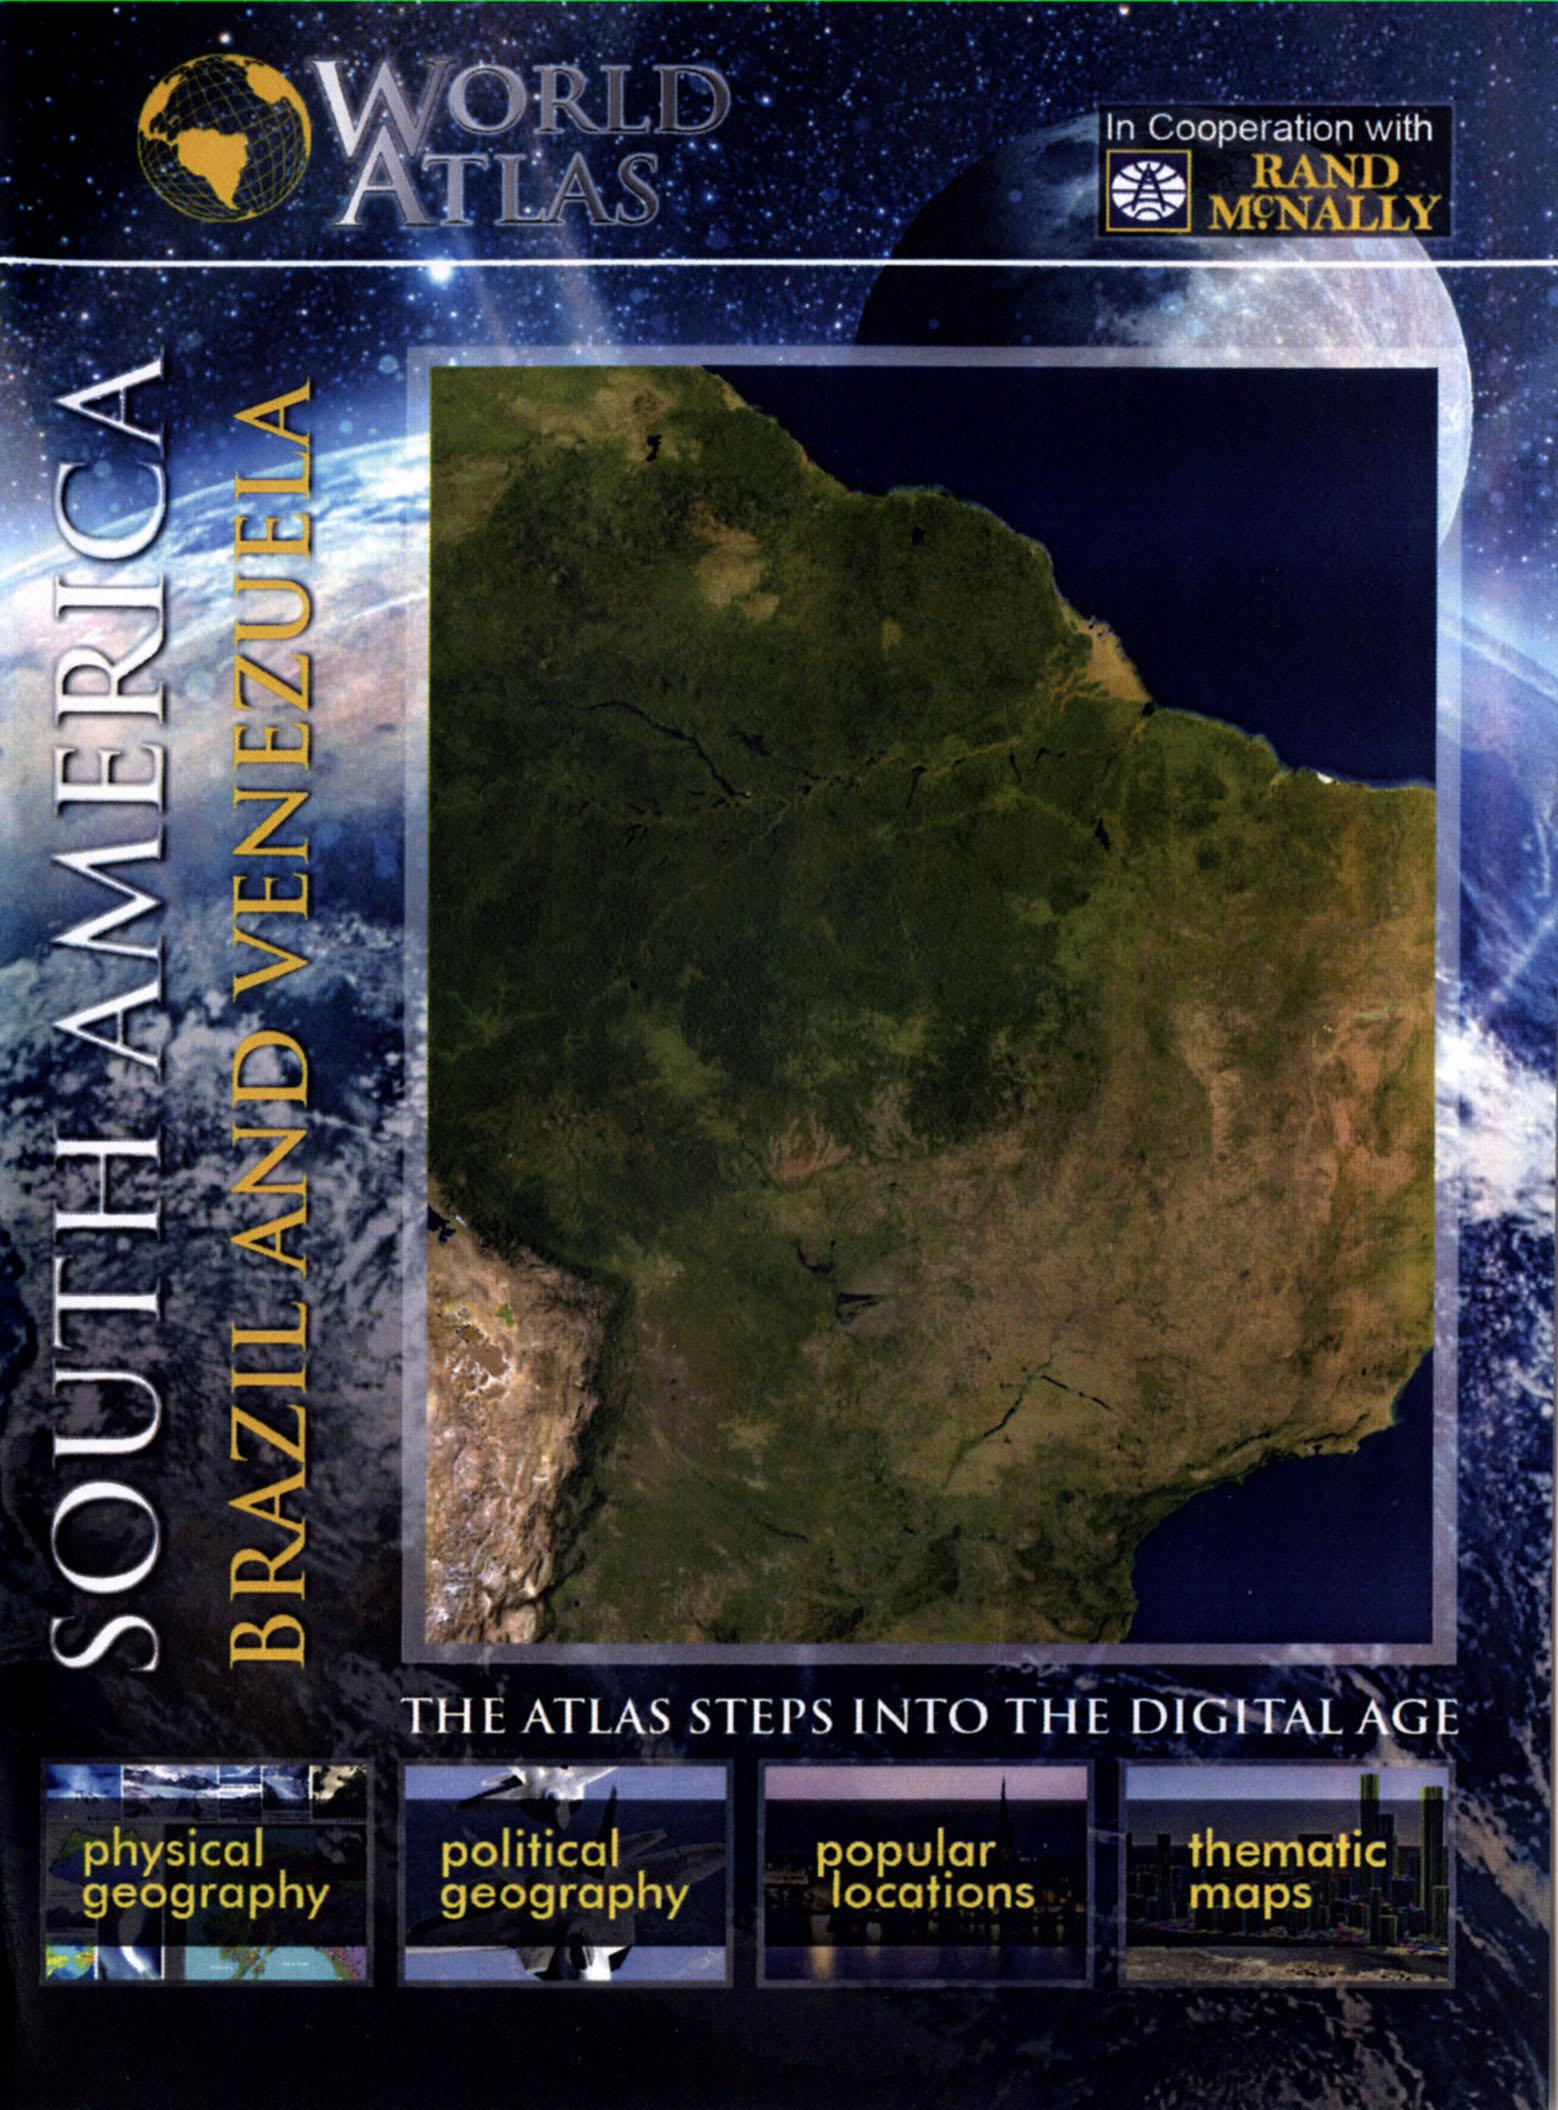 The World Atlas: South America - Brazil and Venezuela